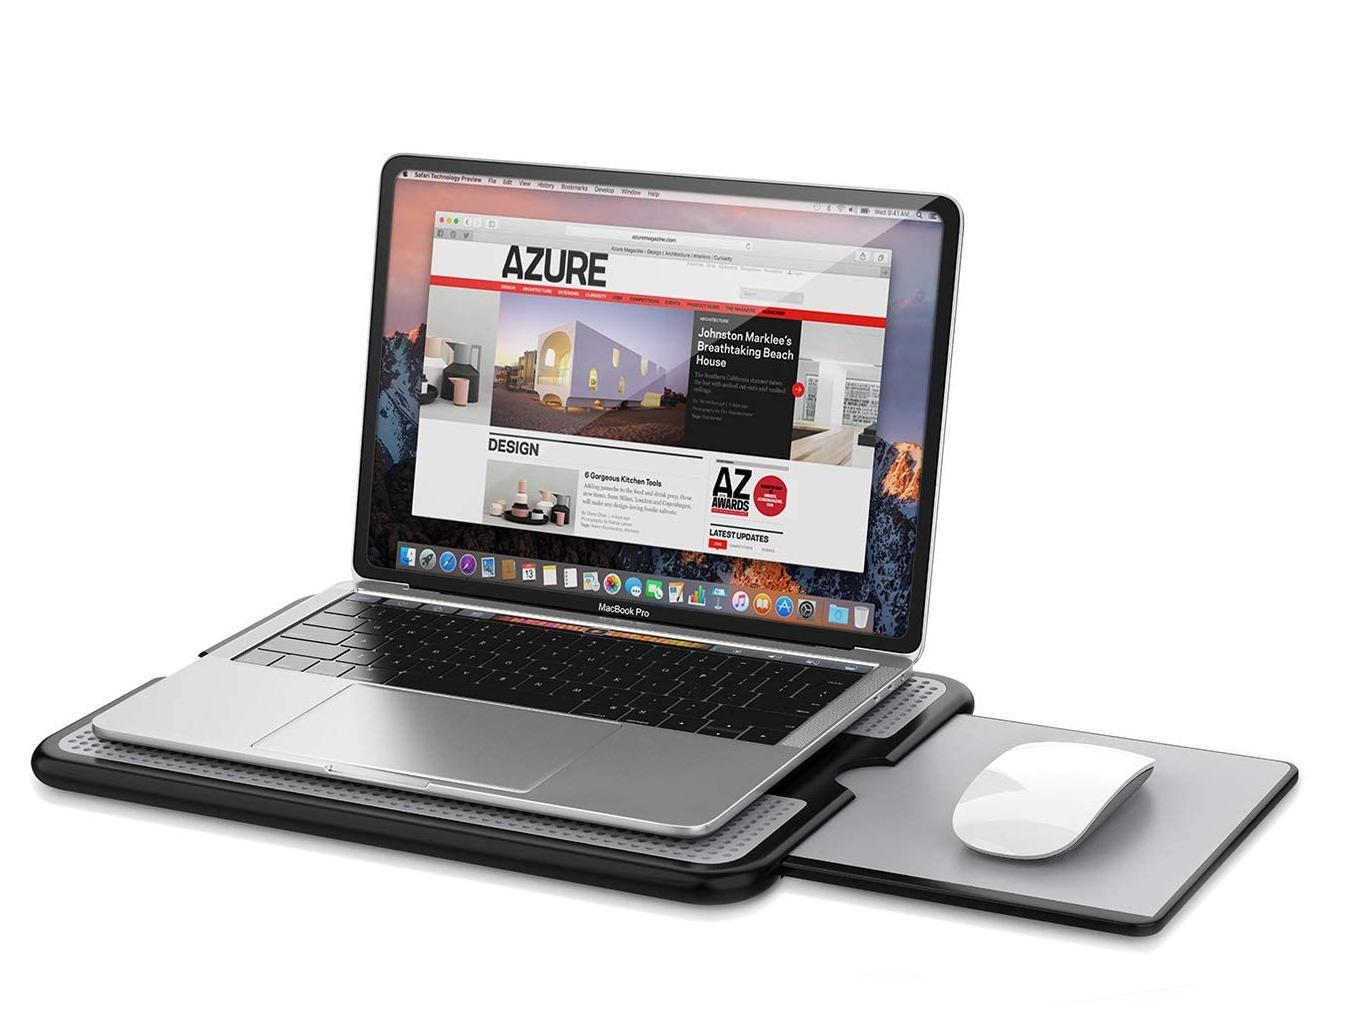 lap-desk-1.jpg